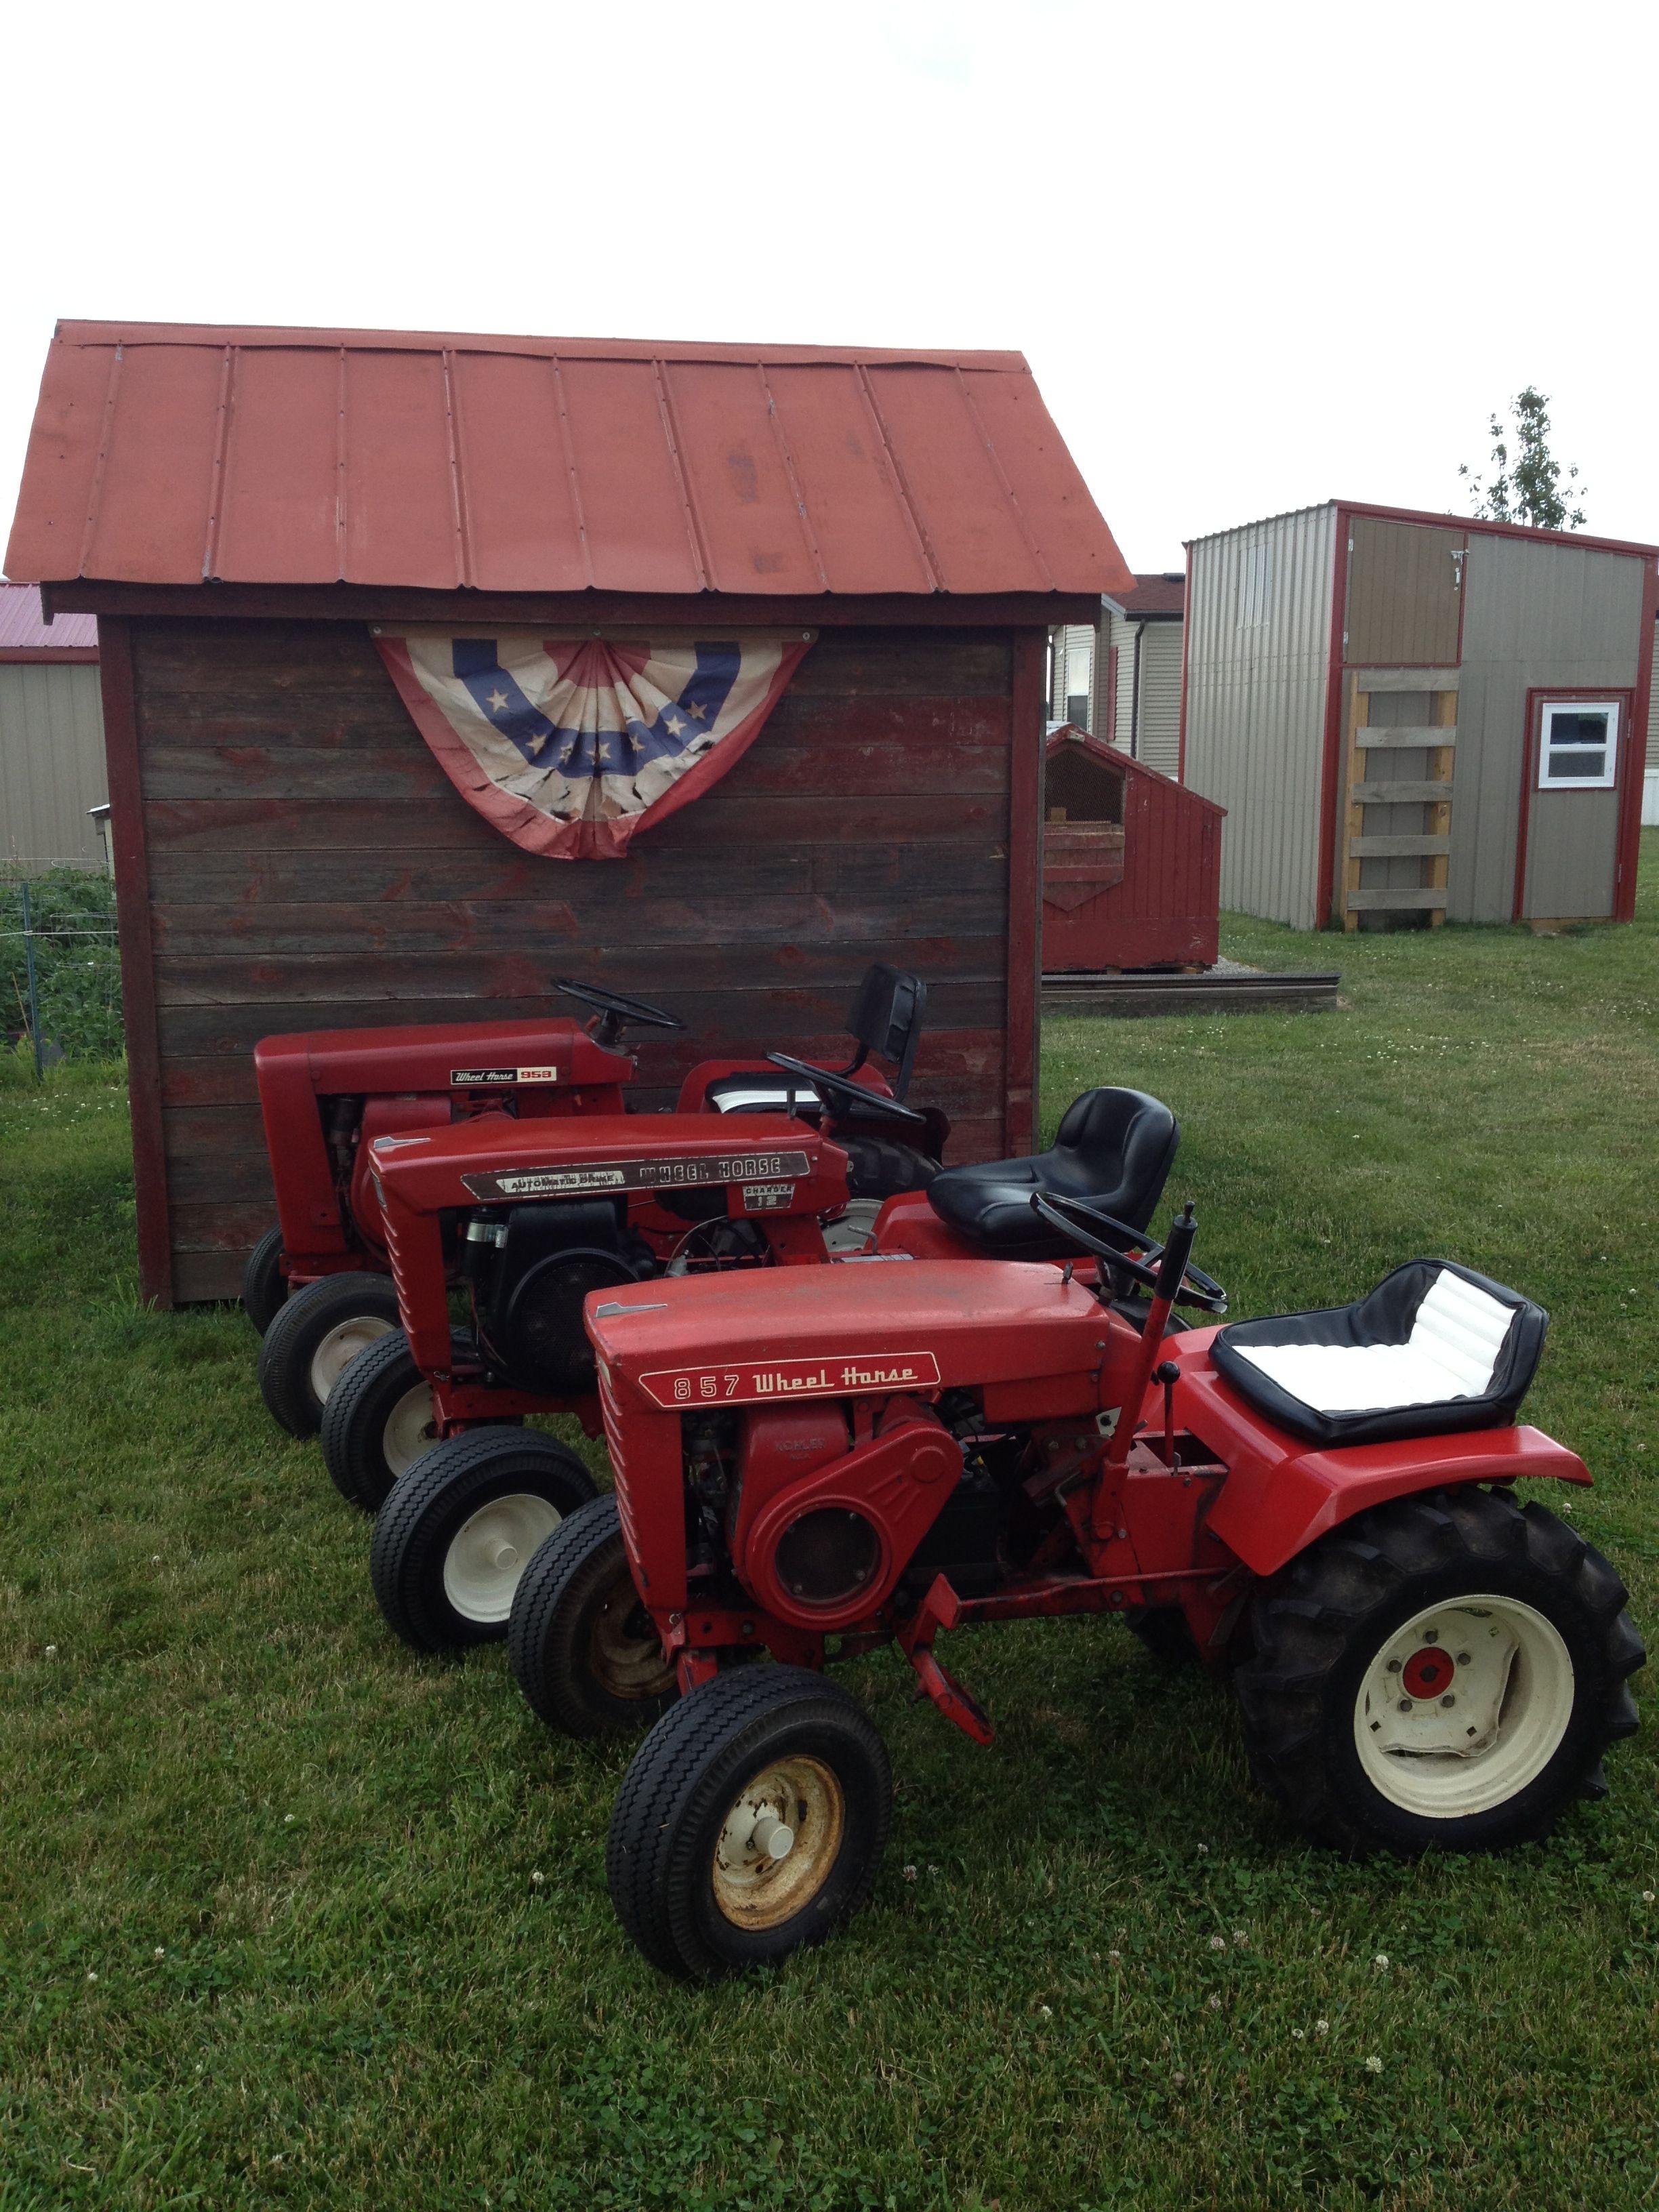 Today S Lineup Wheel Horse Tractor Lawn Tractor Garden Tractor